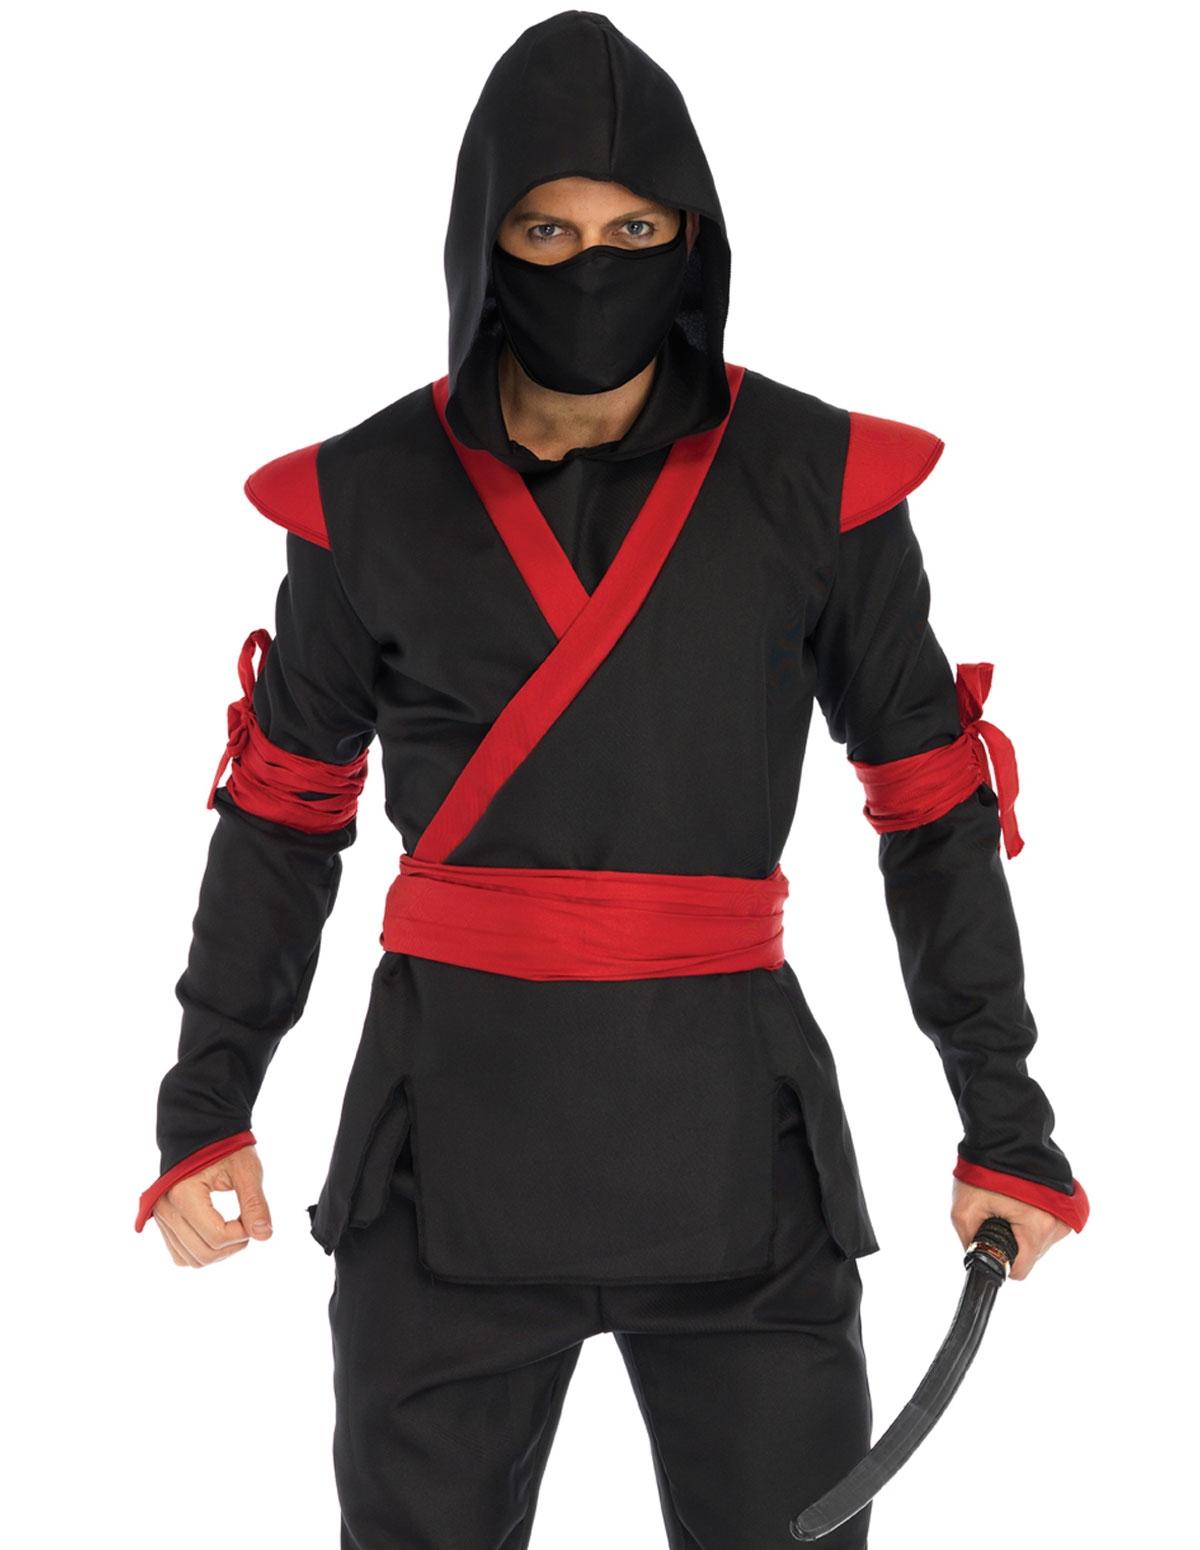 5 Pc Ninja